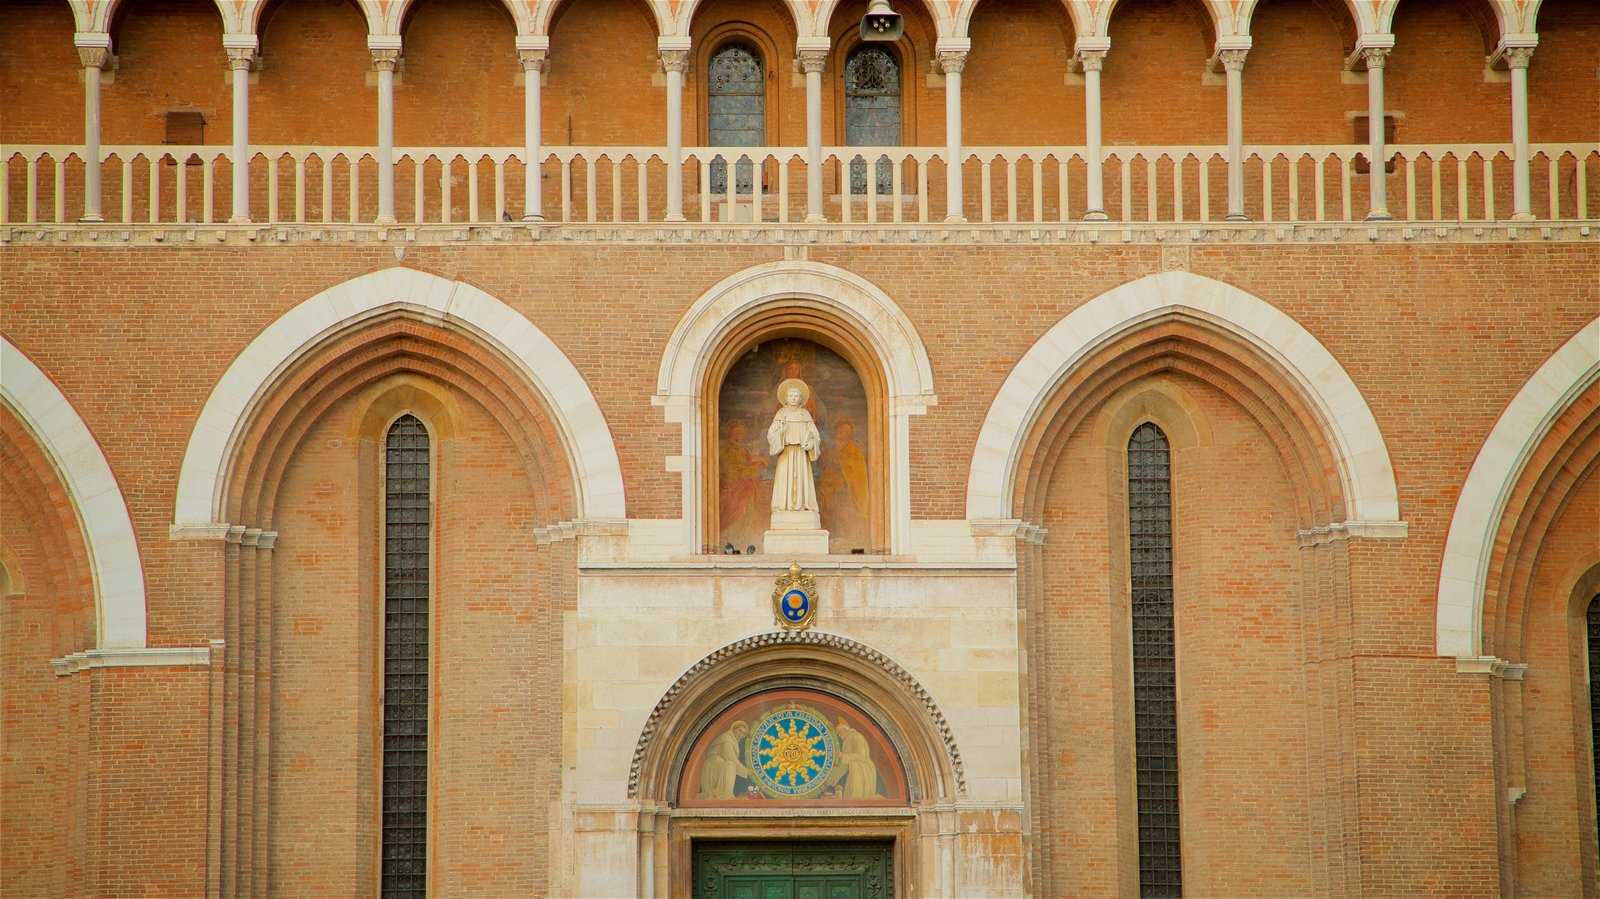 Basilica di Sant\'Antonio da Padova showing a statue or sculpture, religious elements and heritage elements